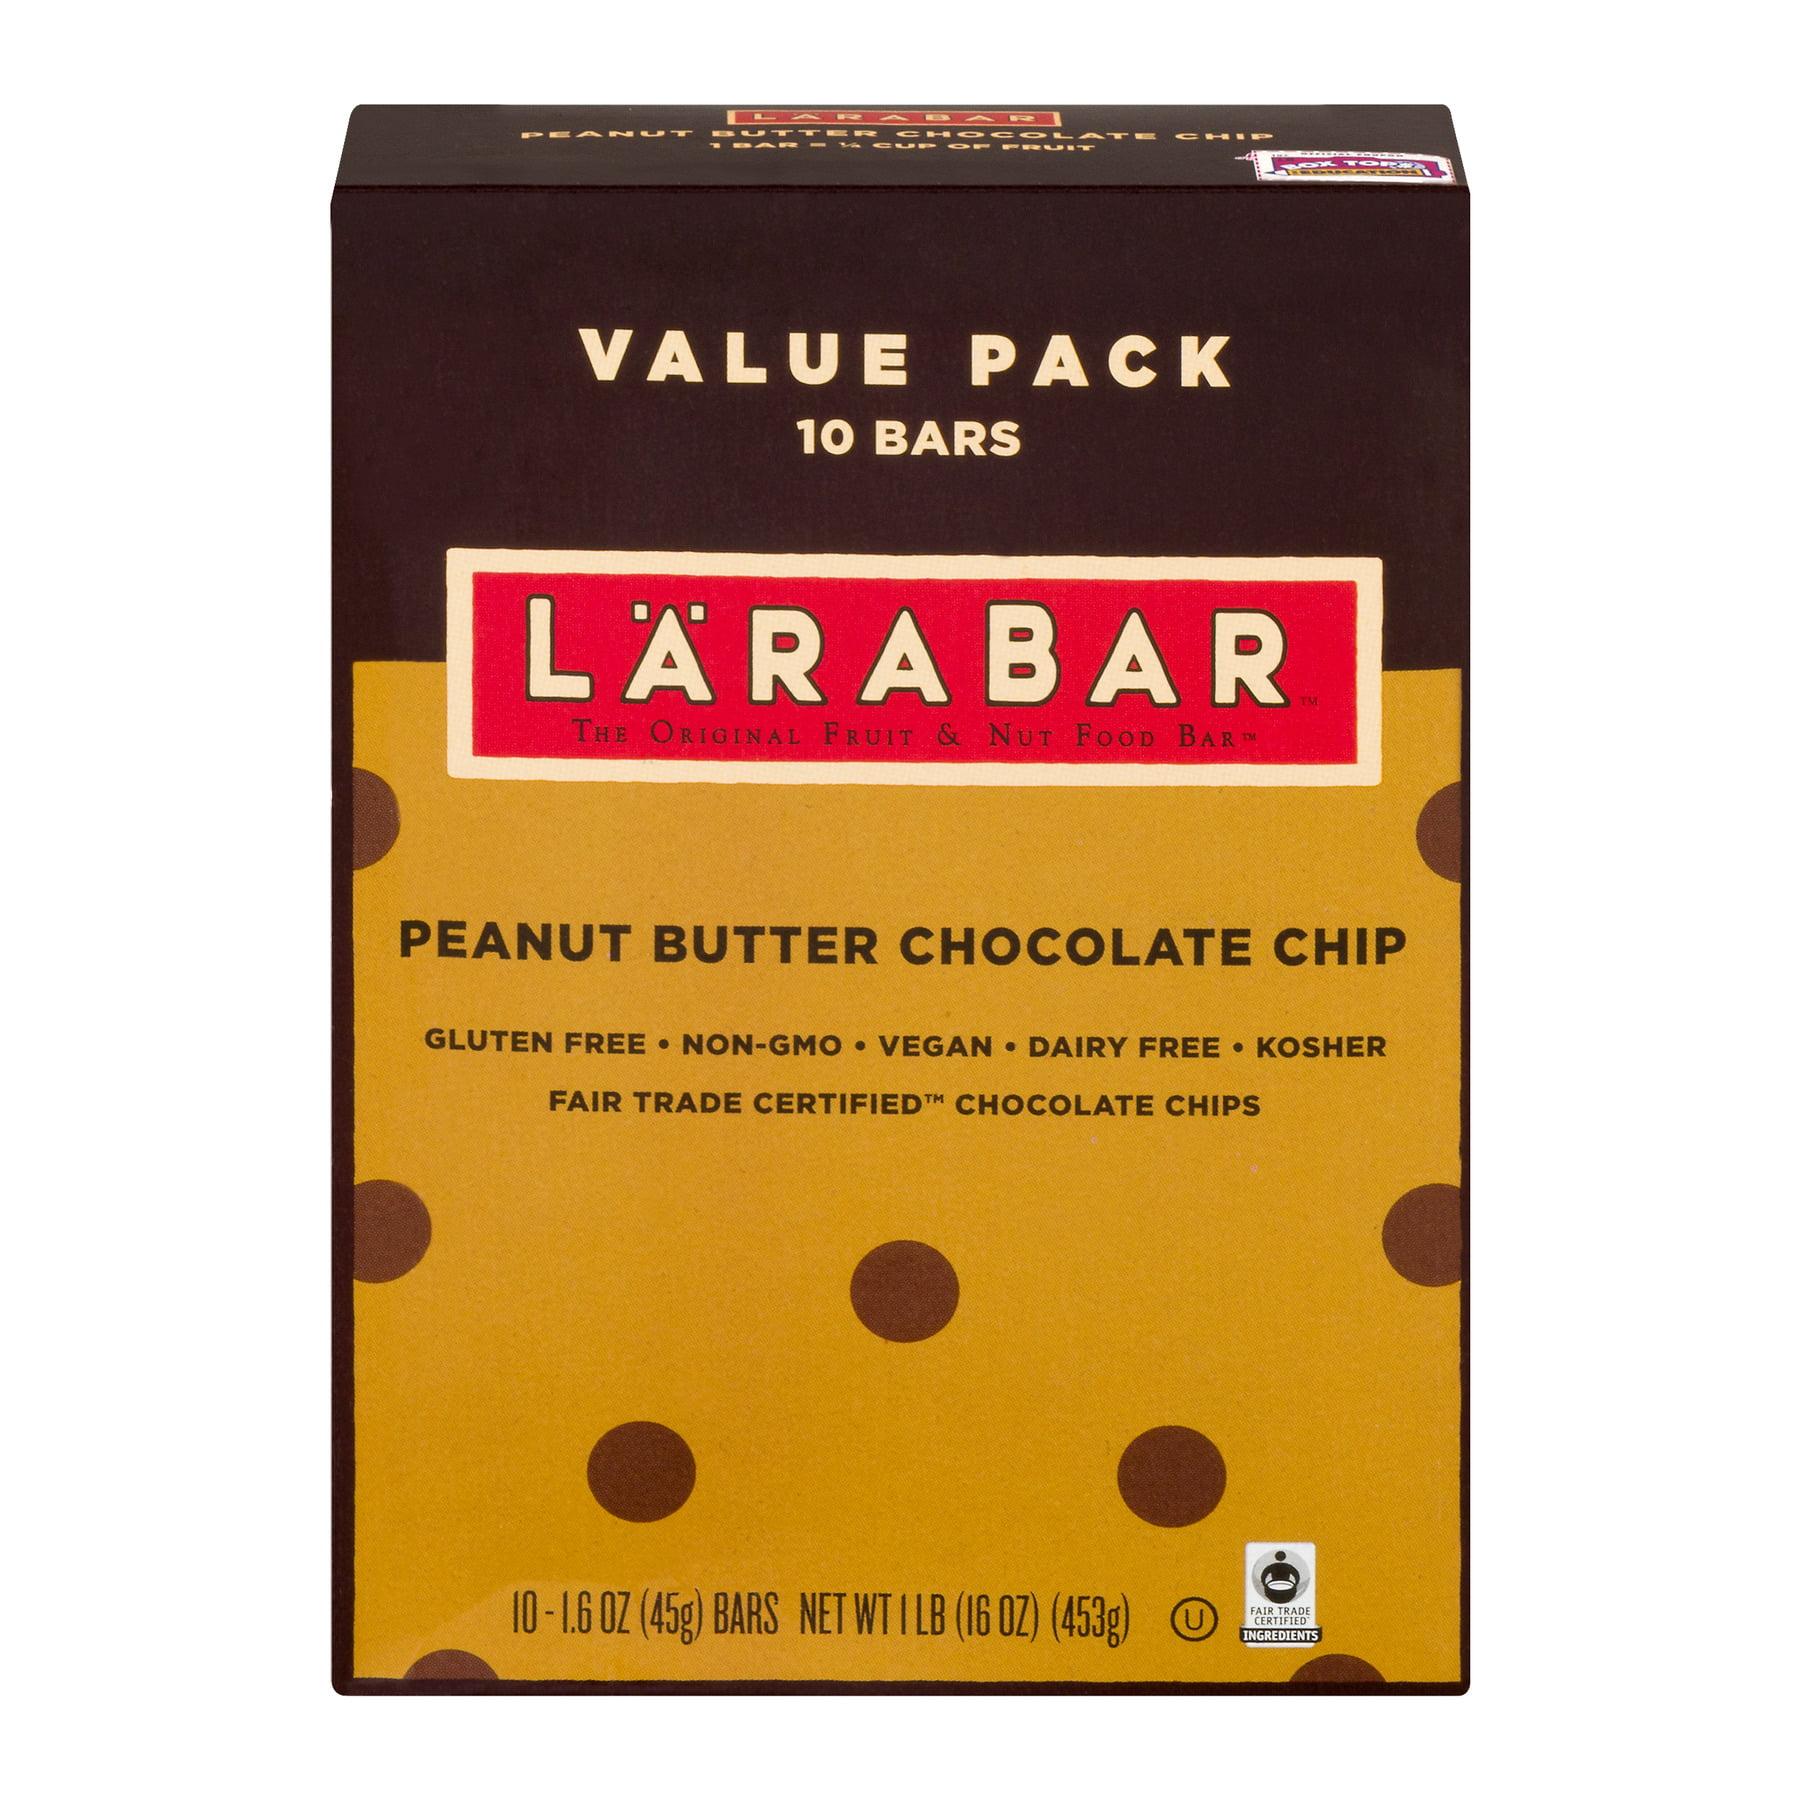 Lãrabar® Peanut Butter Chocolate Chip Fruit & Nut Bars 10 ct Box